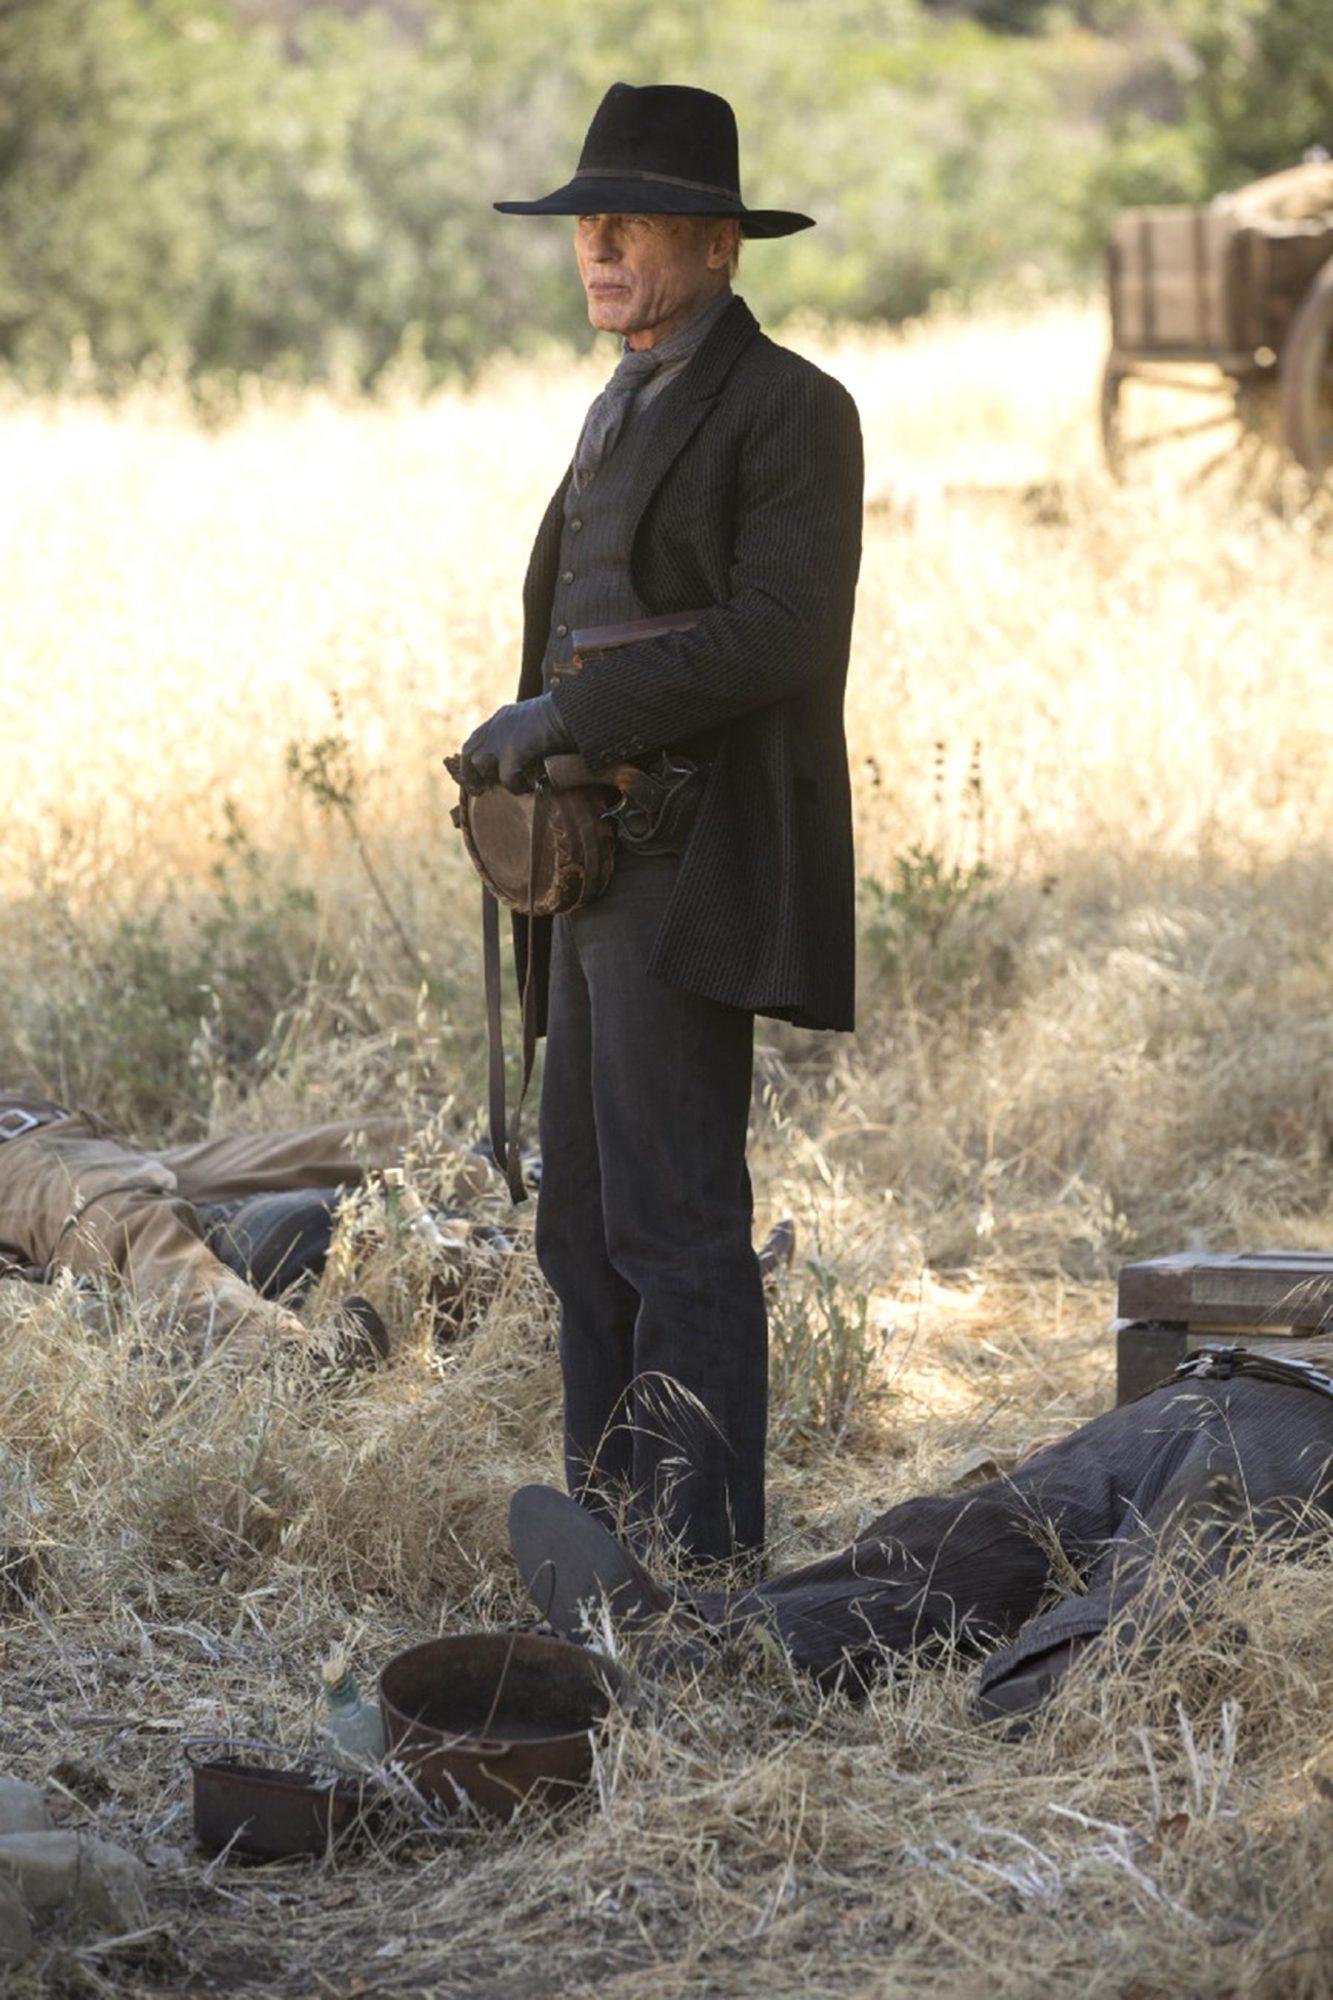 Westworld Season 2 CR: John P. Johnson/HBO